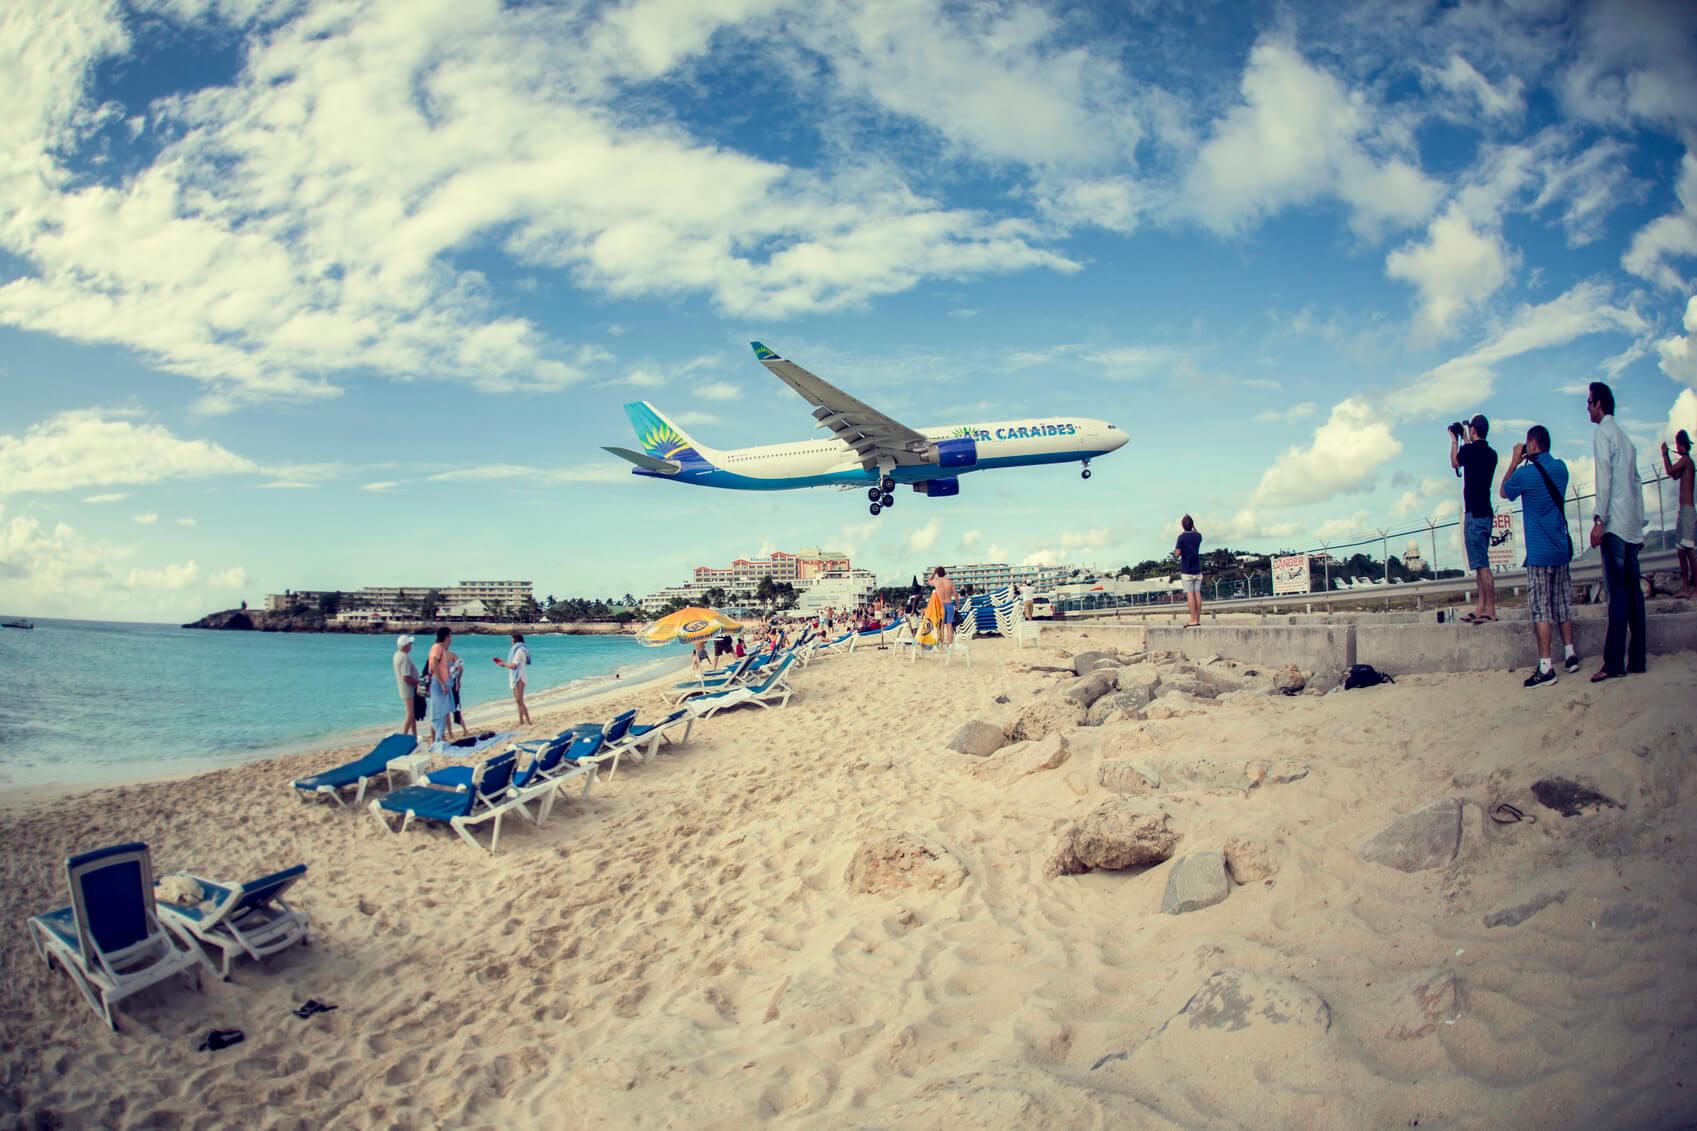 Aeropuerto Internacional Princesa Juliana, Sint Maarten